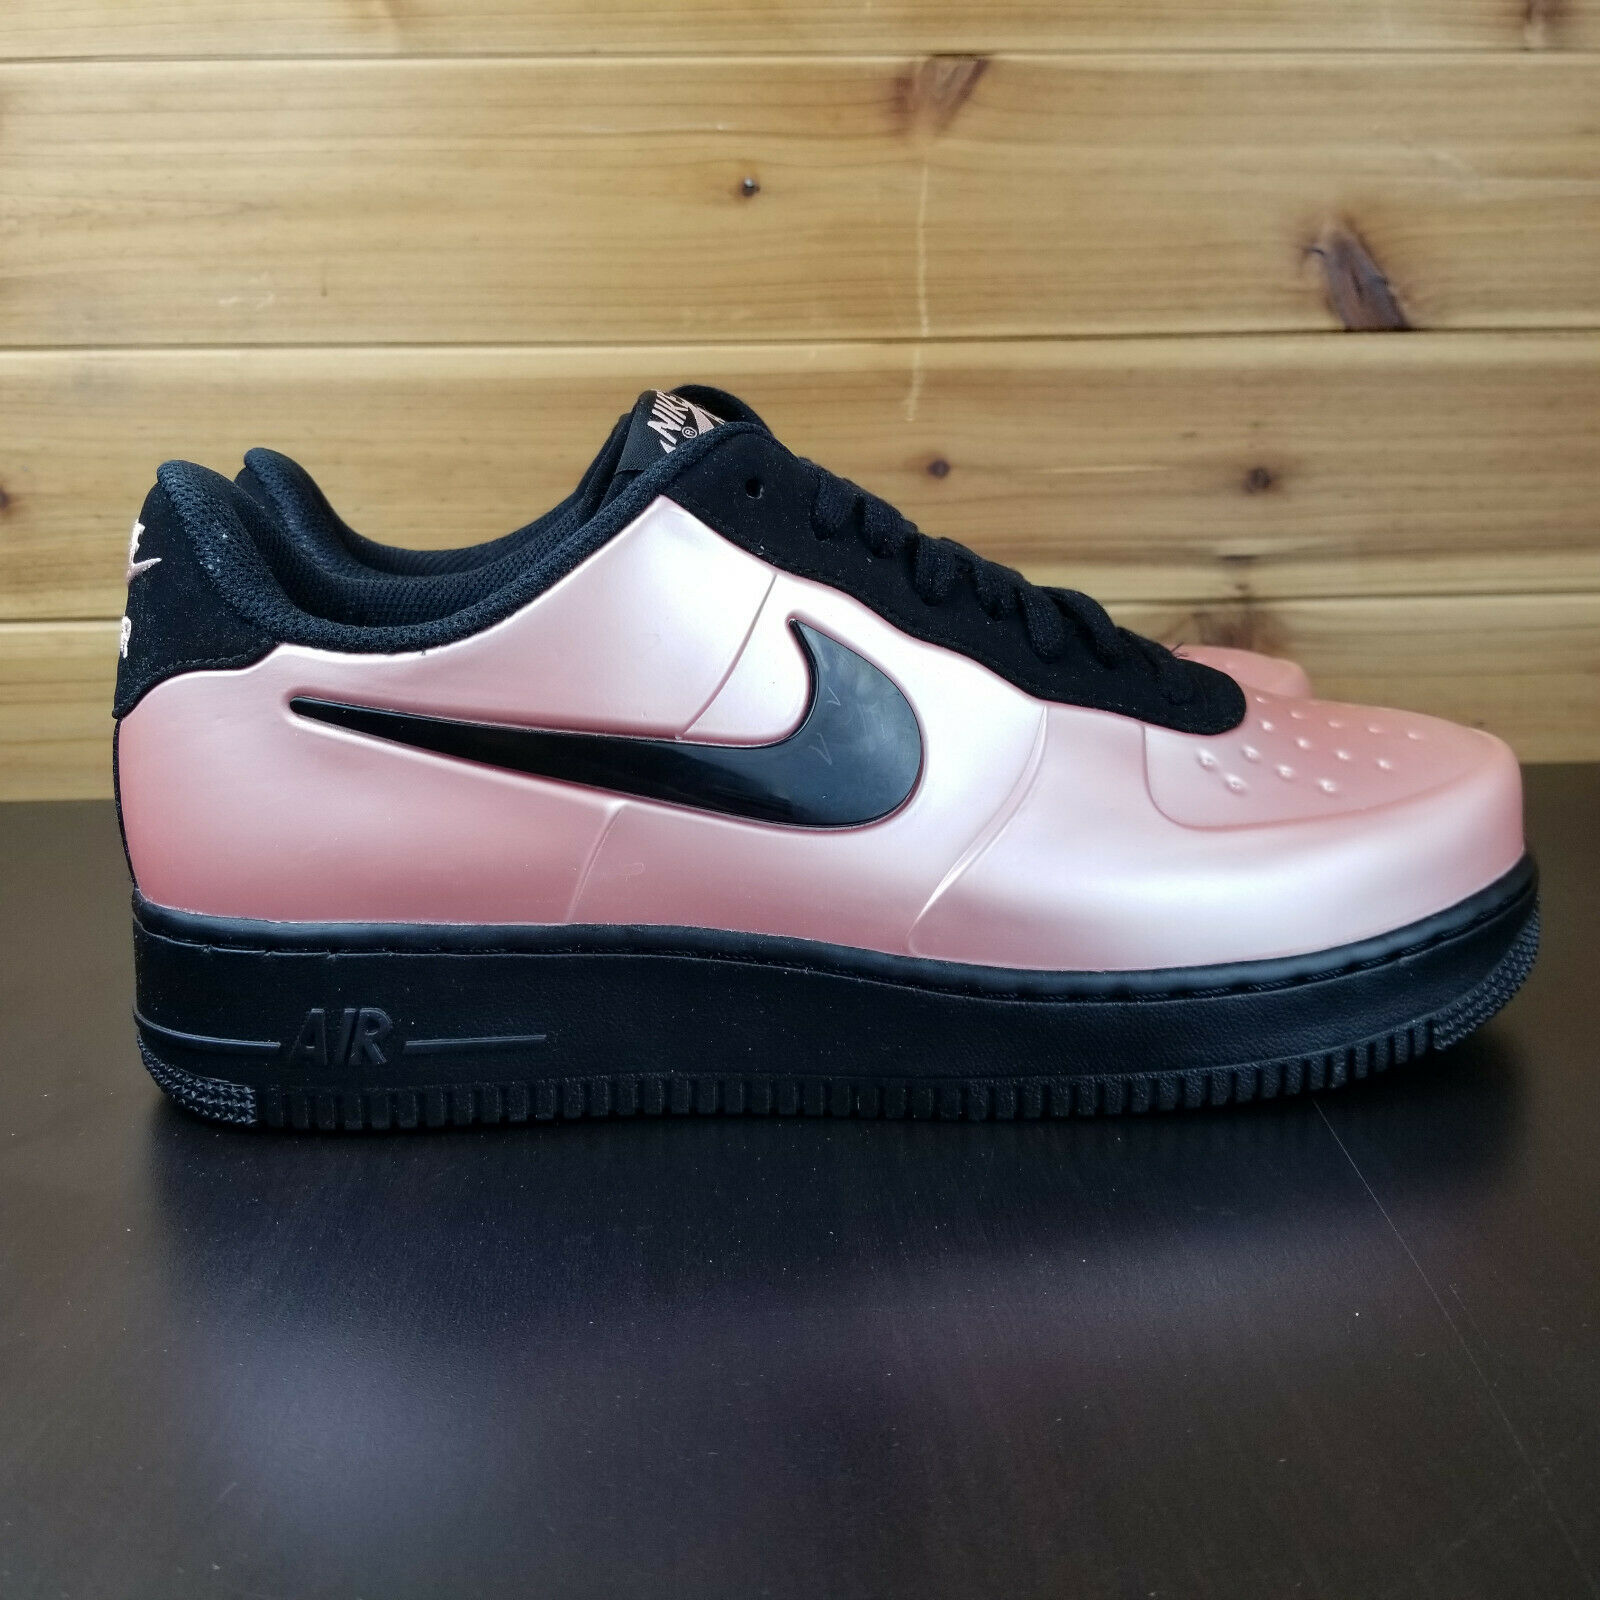 Nike Air  Force 1 Foamposite Pro Cup'Coral Stardust 'AJ3664 -600  preferenziale